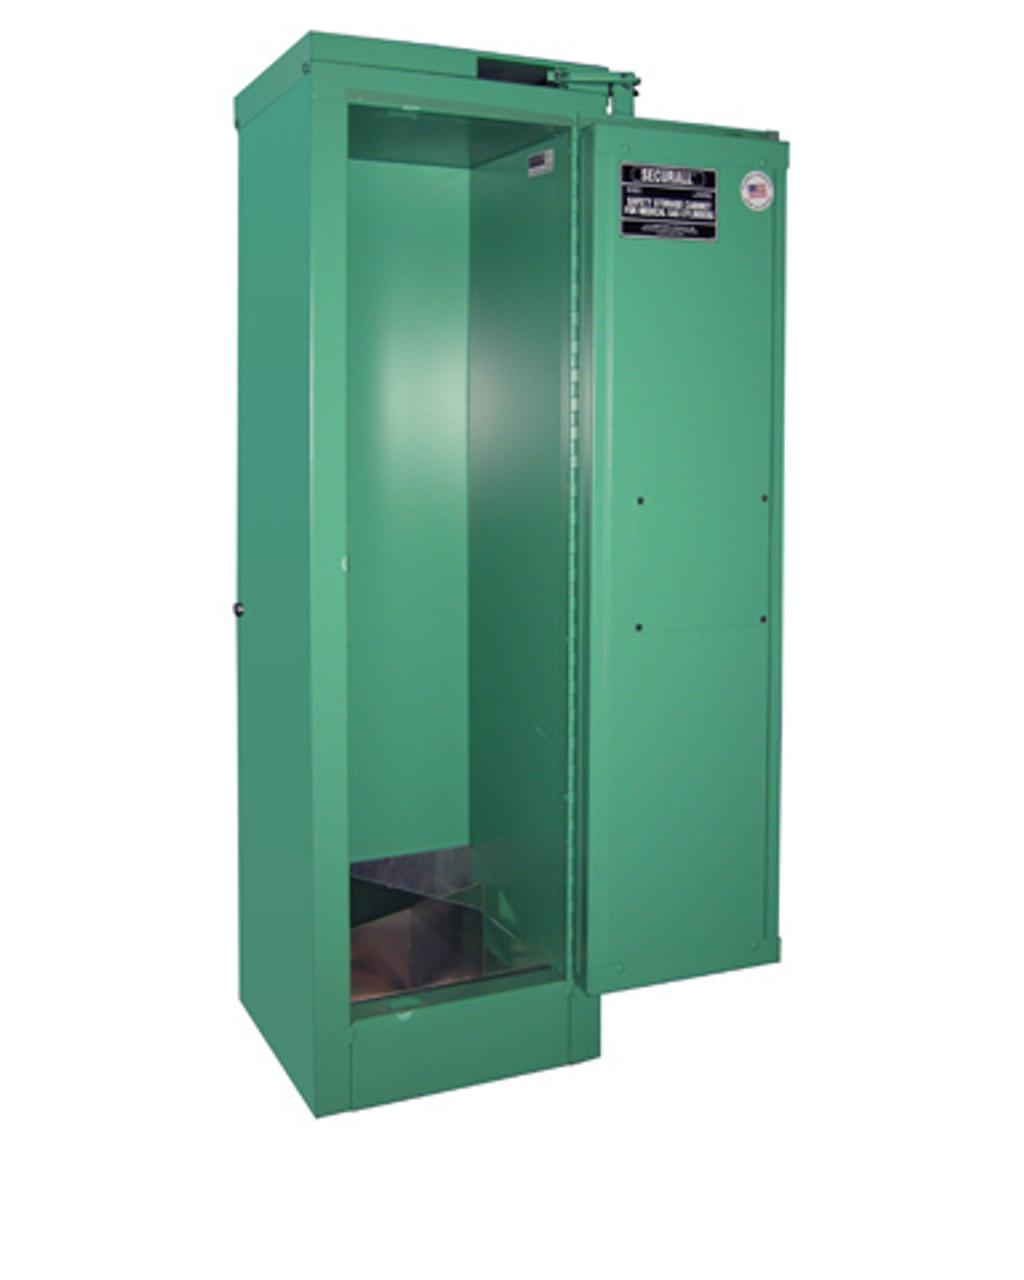 Medical Oxygen Cylinder Storage Cabinet - Fire Lined - 2-4 Cylinders